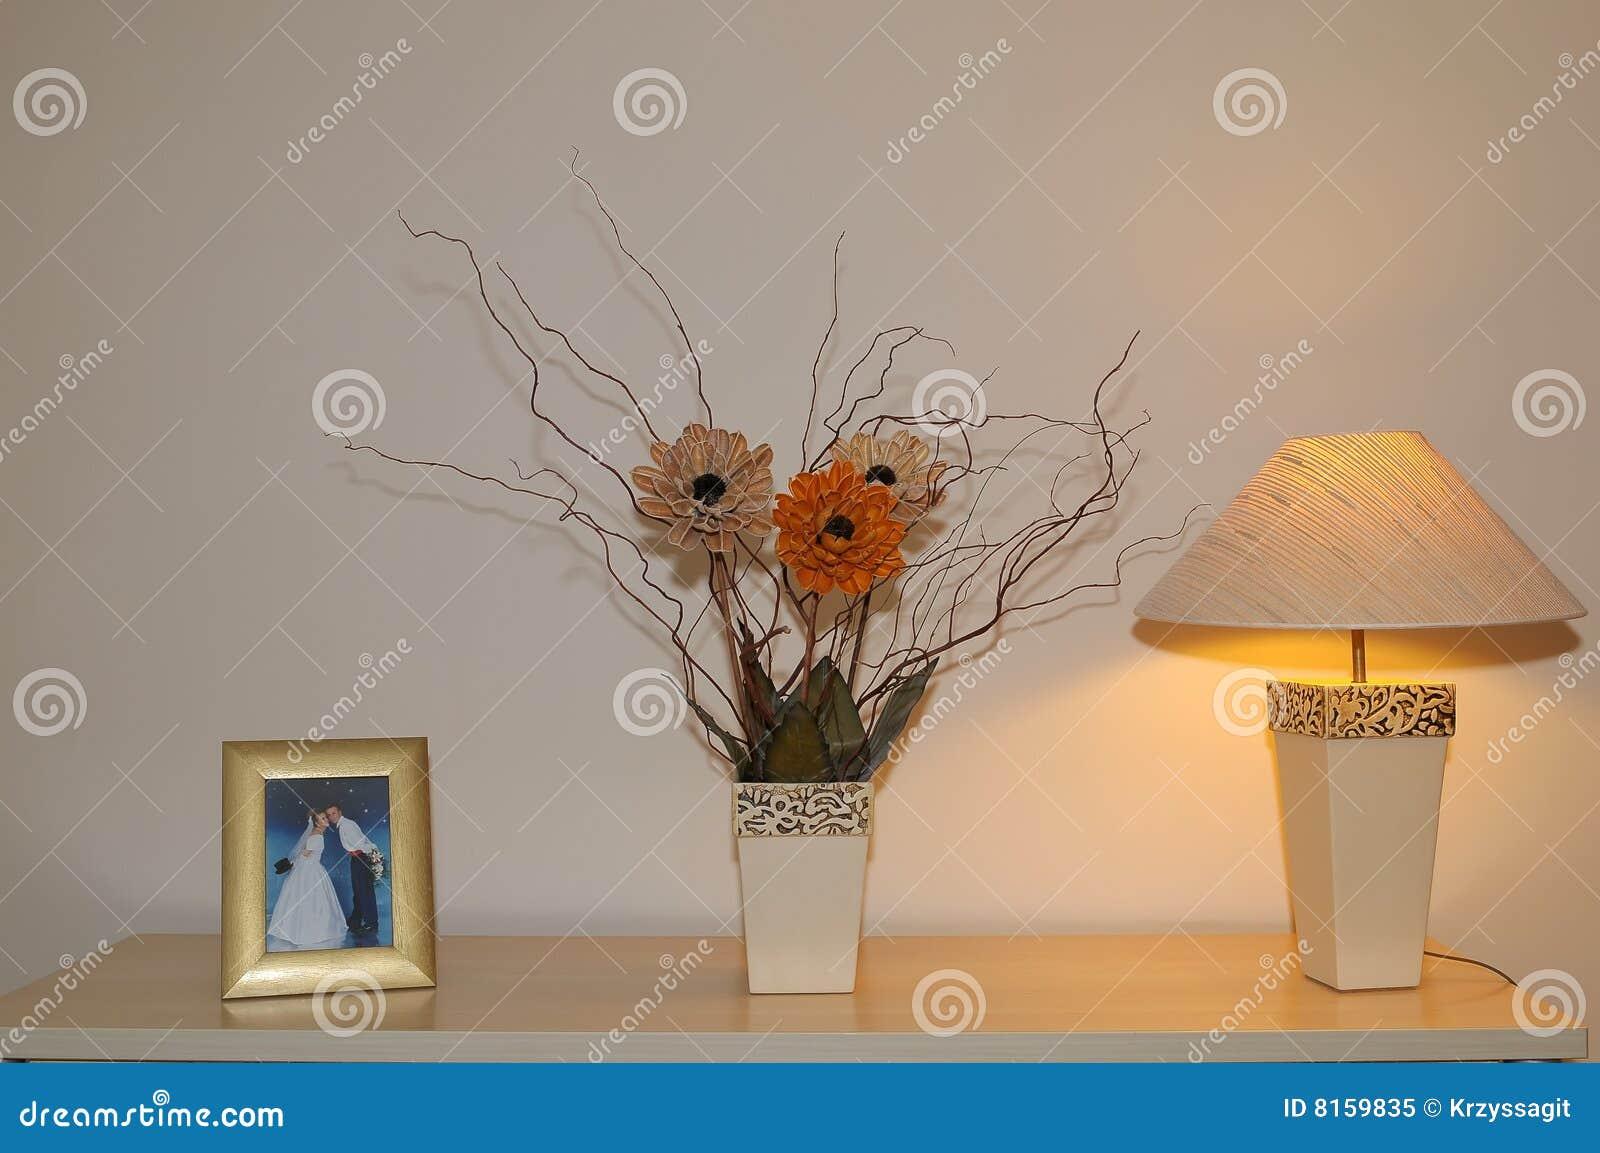 Home Decor Royalty Free Stock Photo Image 8159835